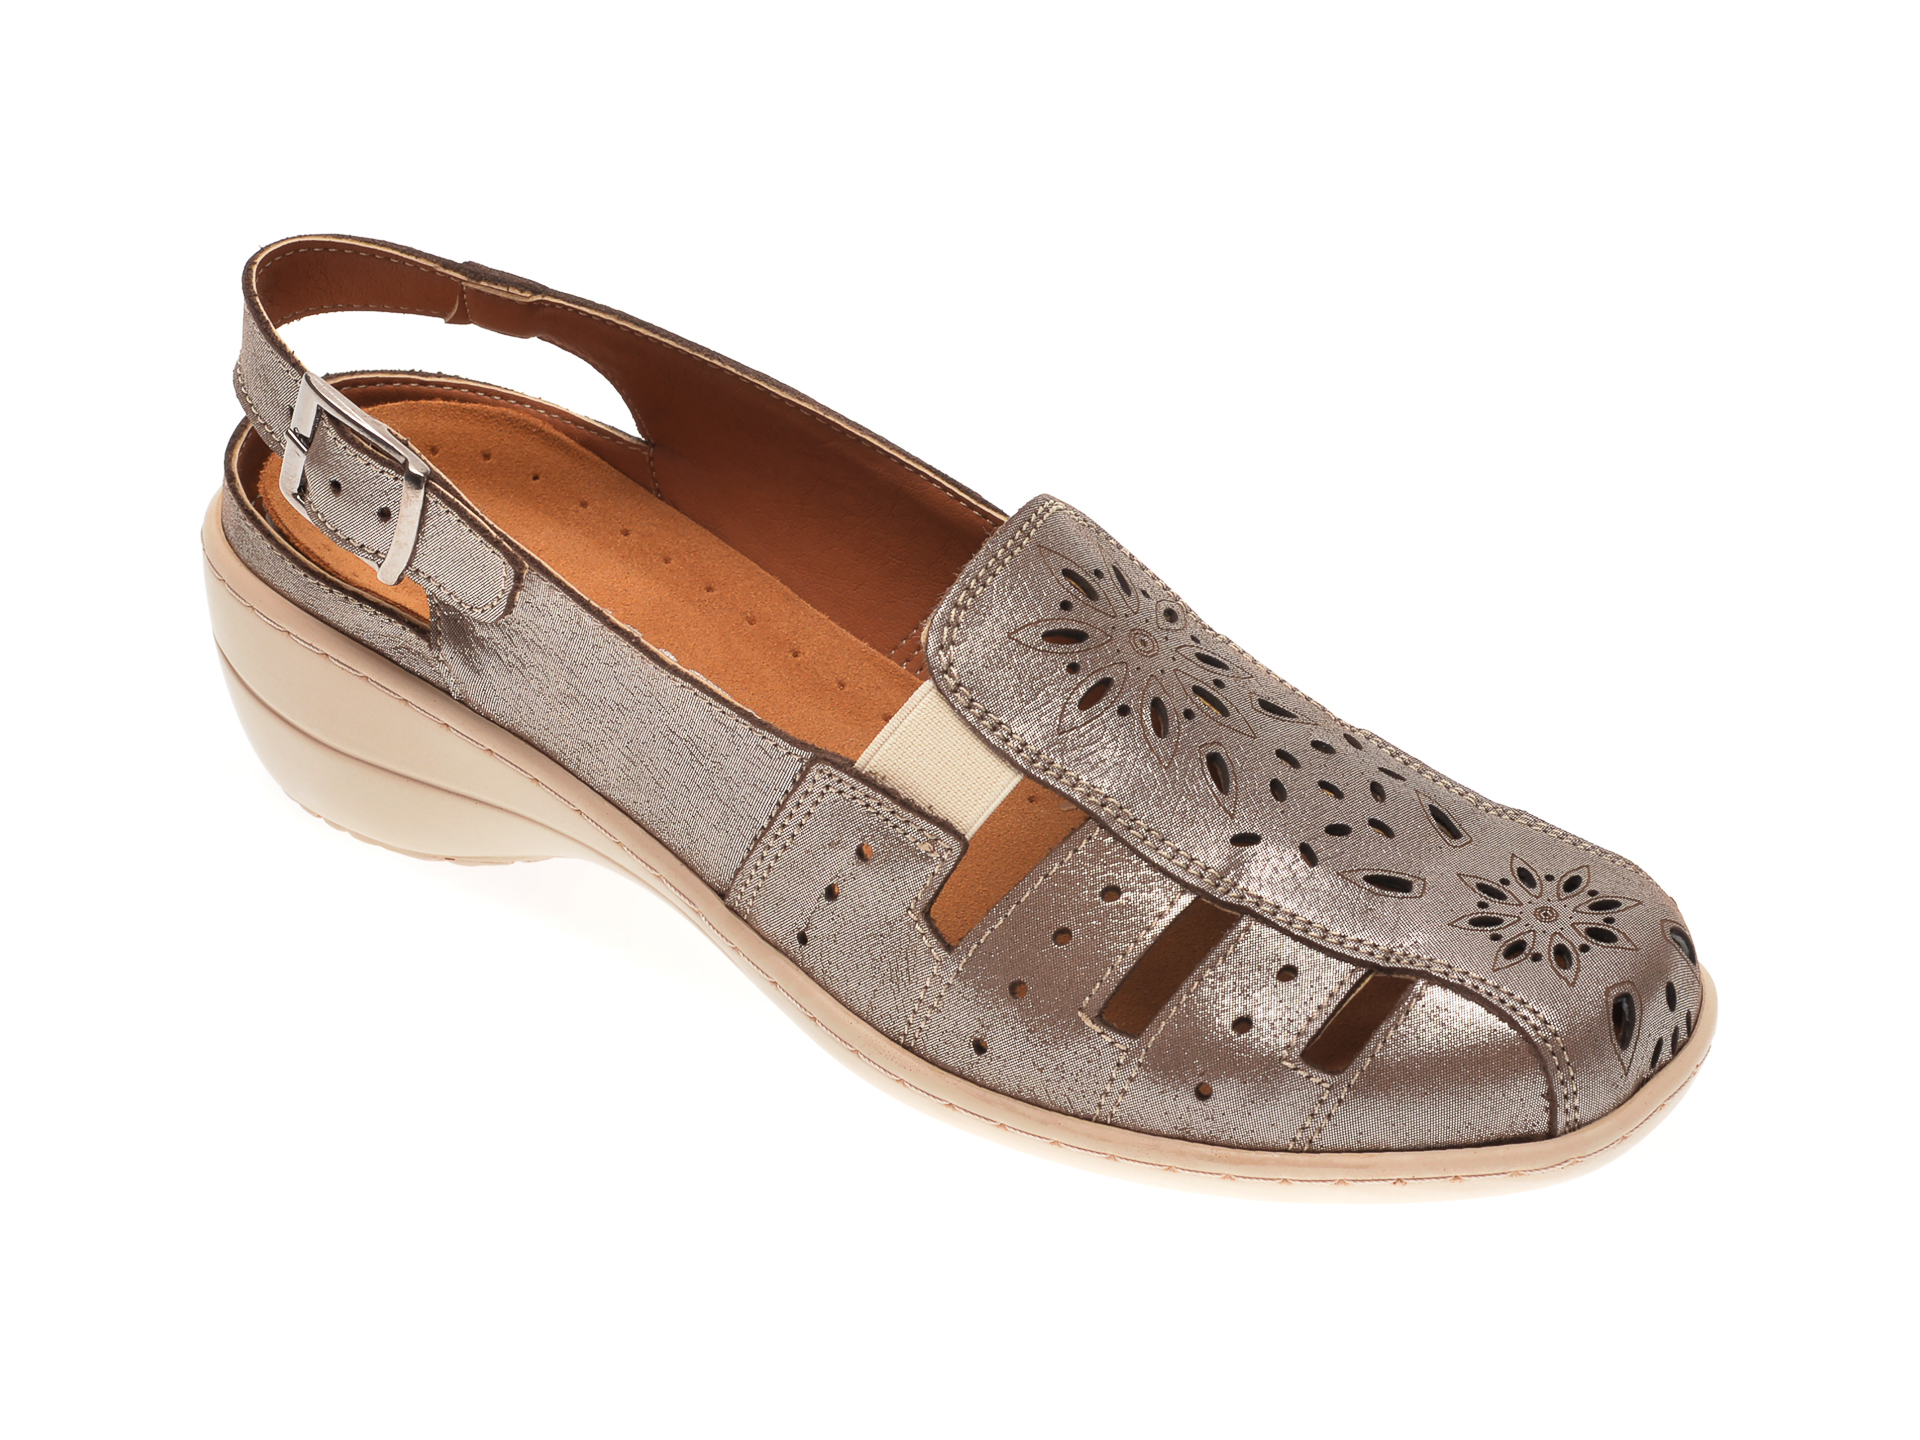 Pantofi Lumel, Argintiu, 20212, Din Piele Naturala